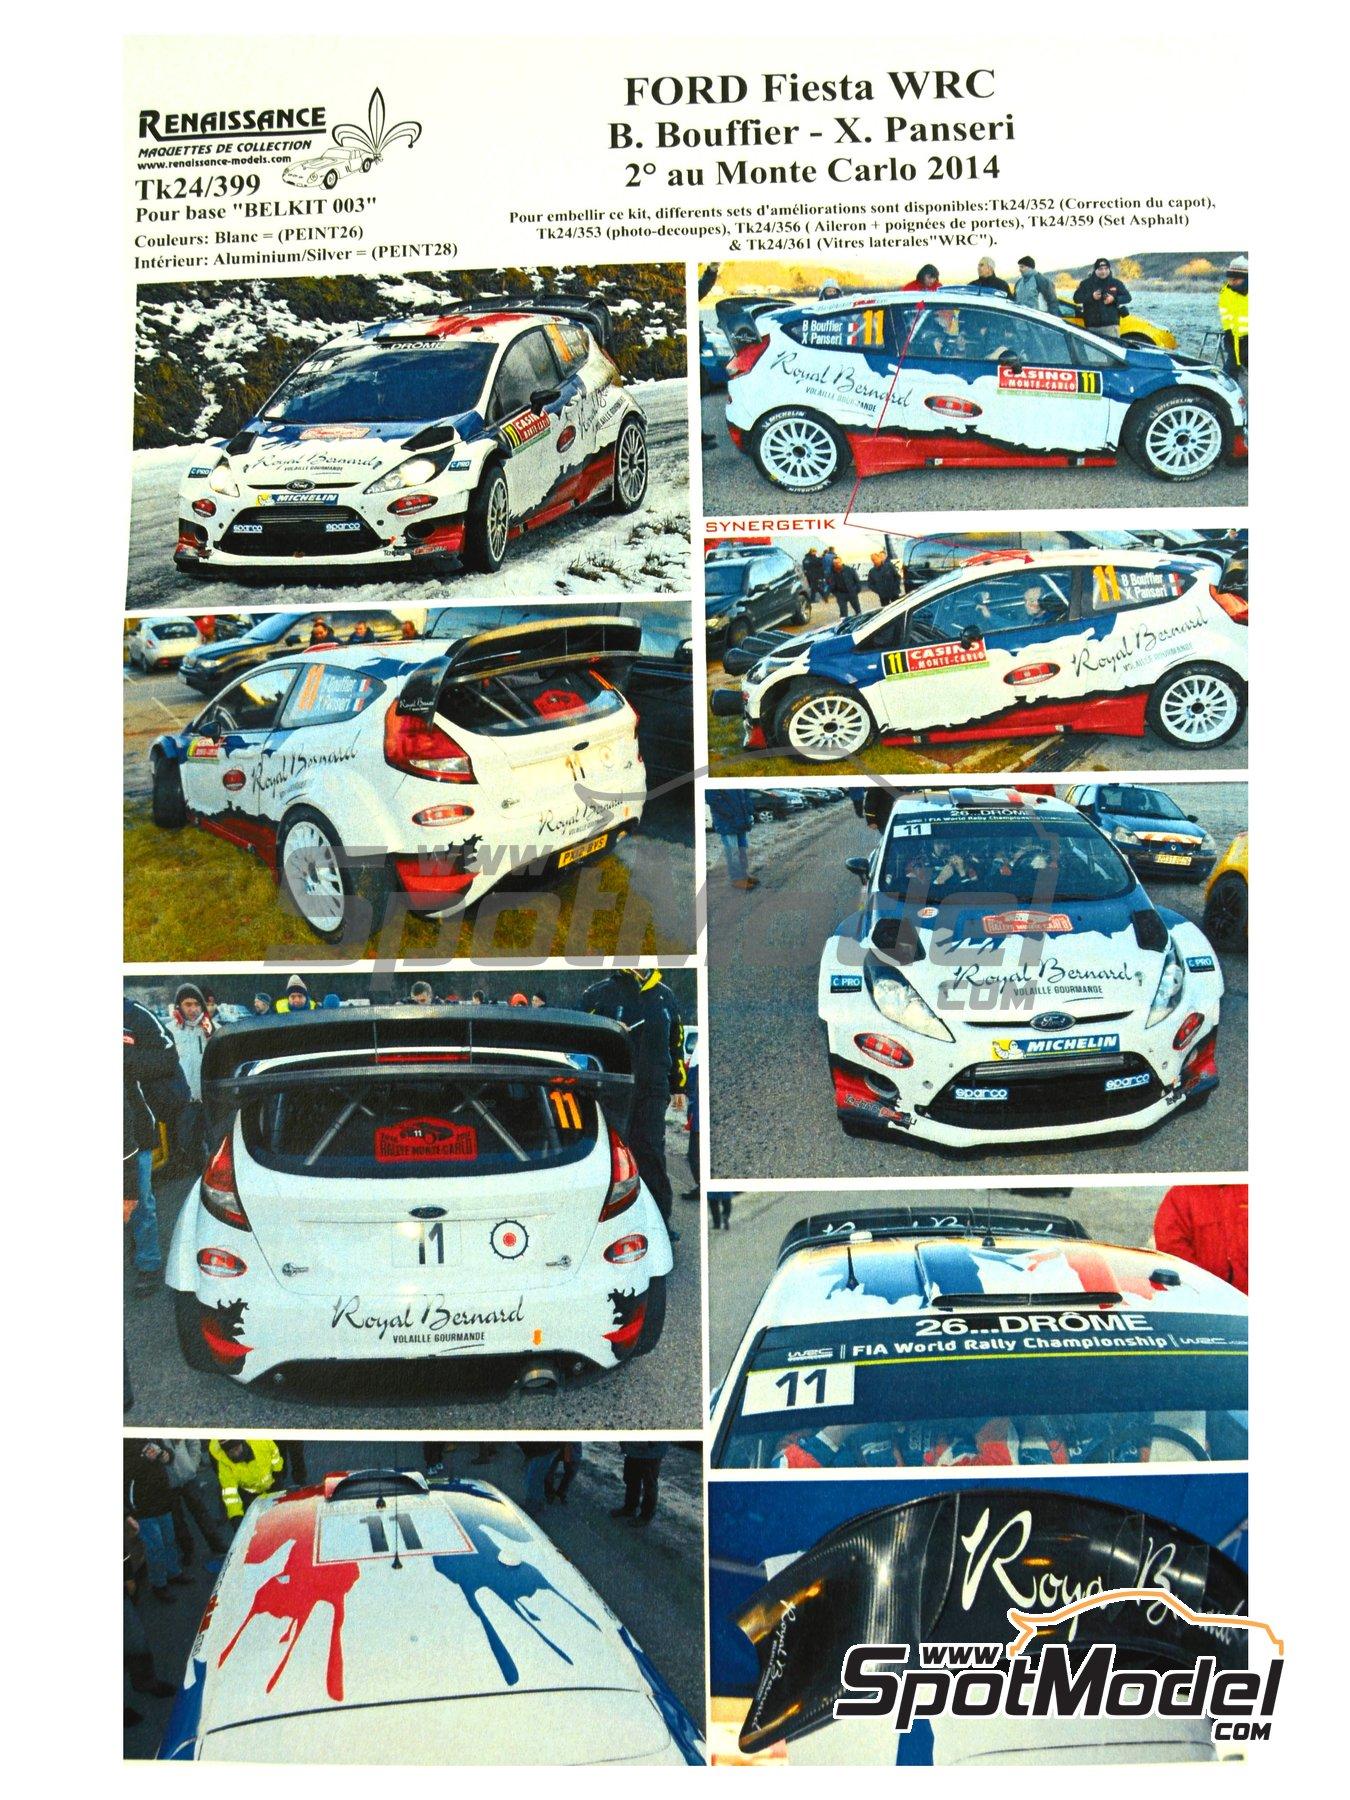 Ford Fiesta WRC Royal Bernard - Rally de Montecarlo 2014 | Calcas de agua en escala1/24 fabricado por Renaissance Models (ref.TK24-399) image